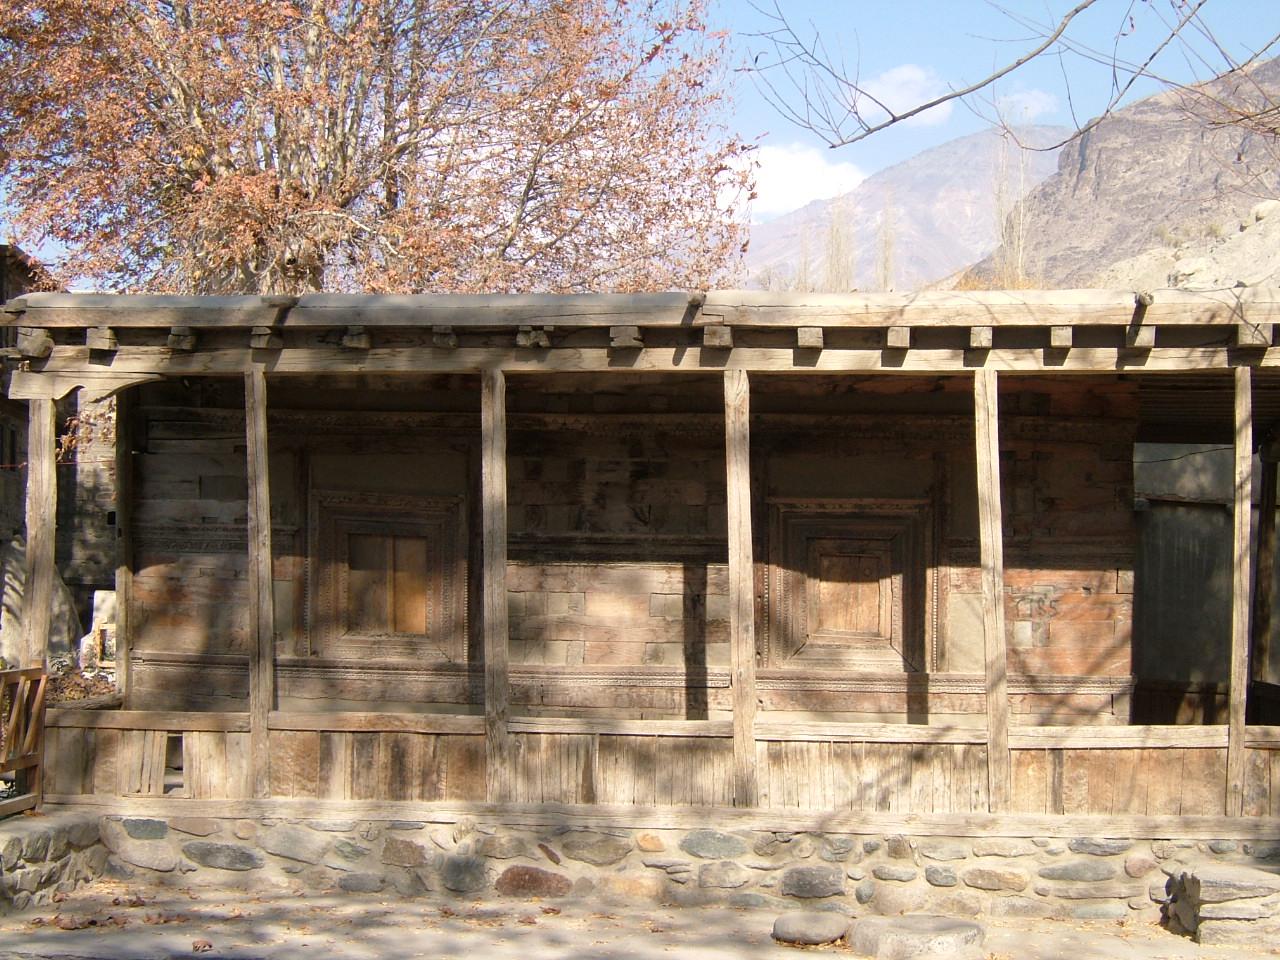 2049848790 738021b1dc o - Shigar Fort Residence Baltitstan